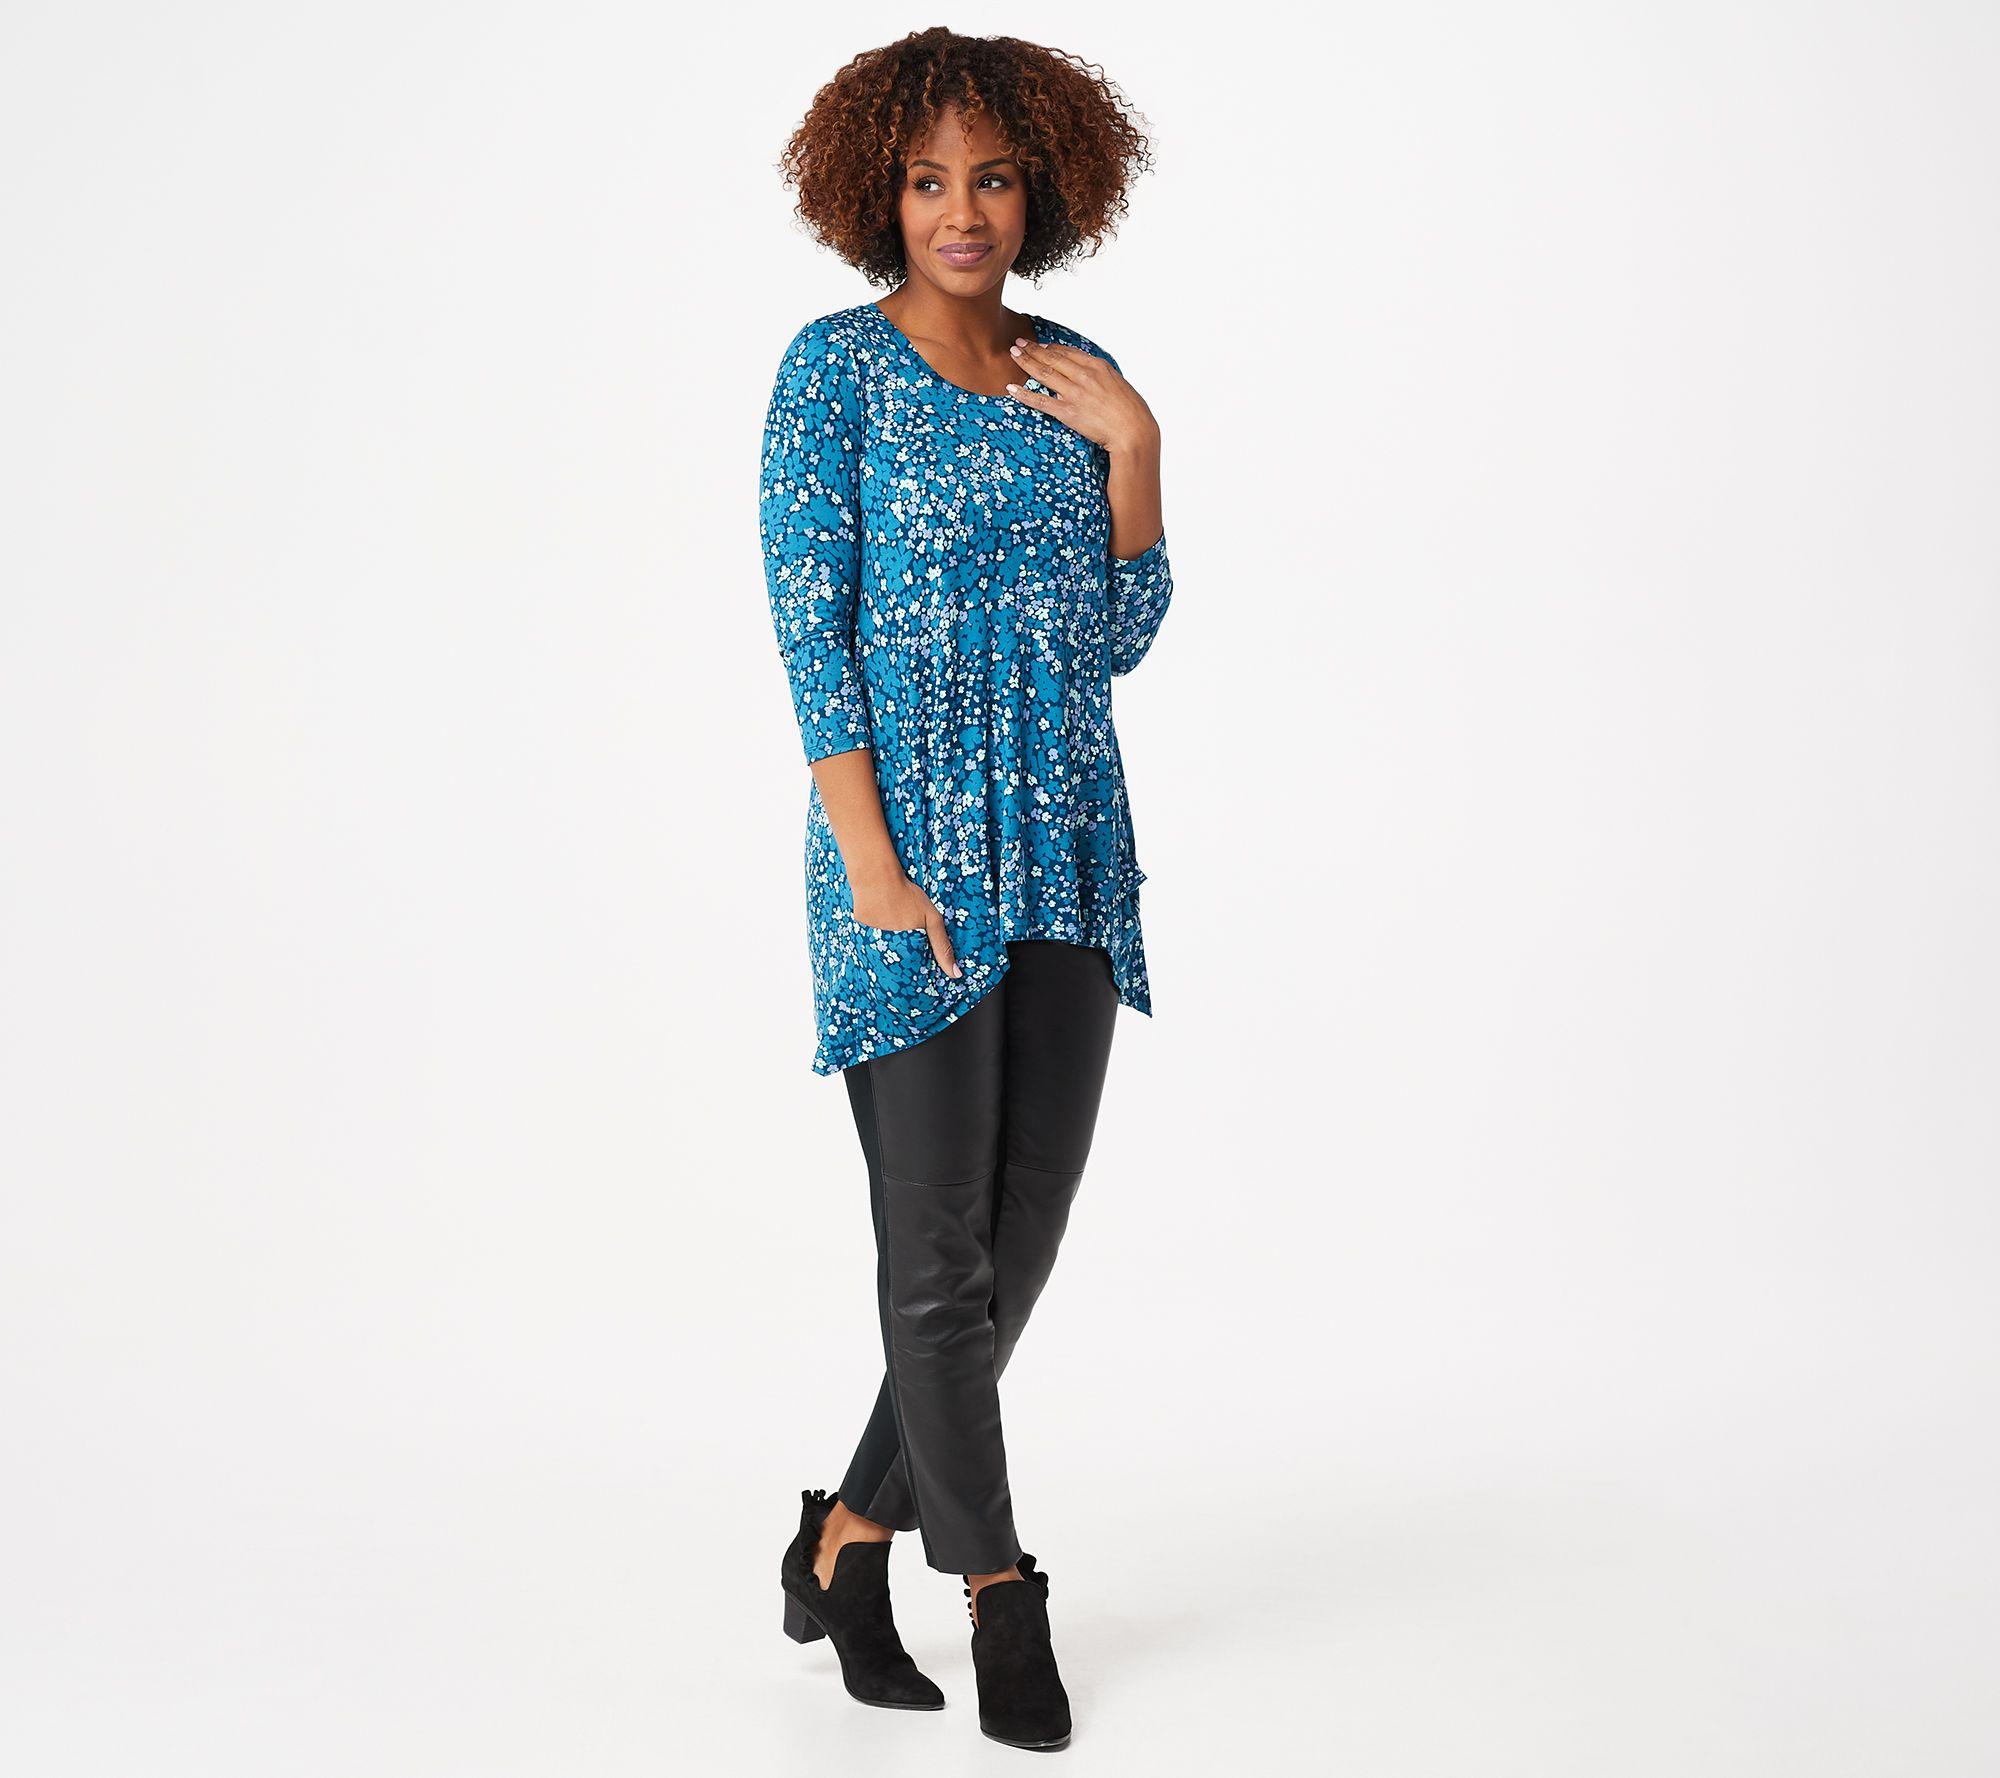 LOGO Lori Goldstein Coal Grey Cotton Slub Oversized S//S Tee Knit Top Slits New